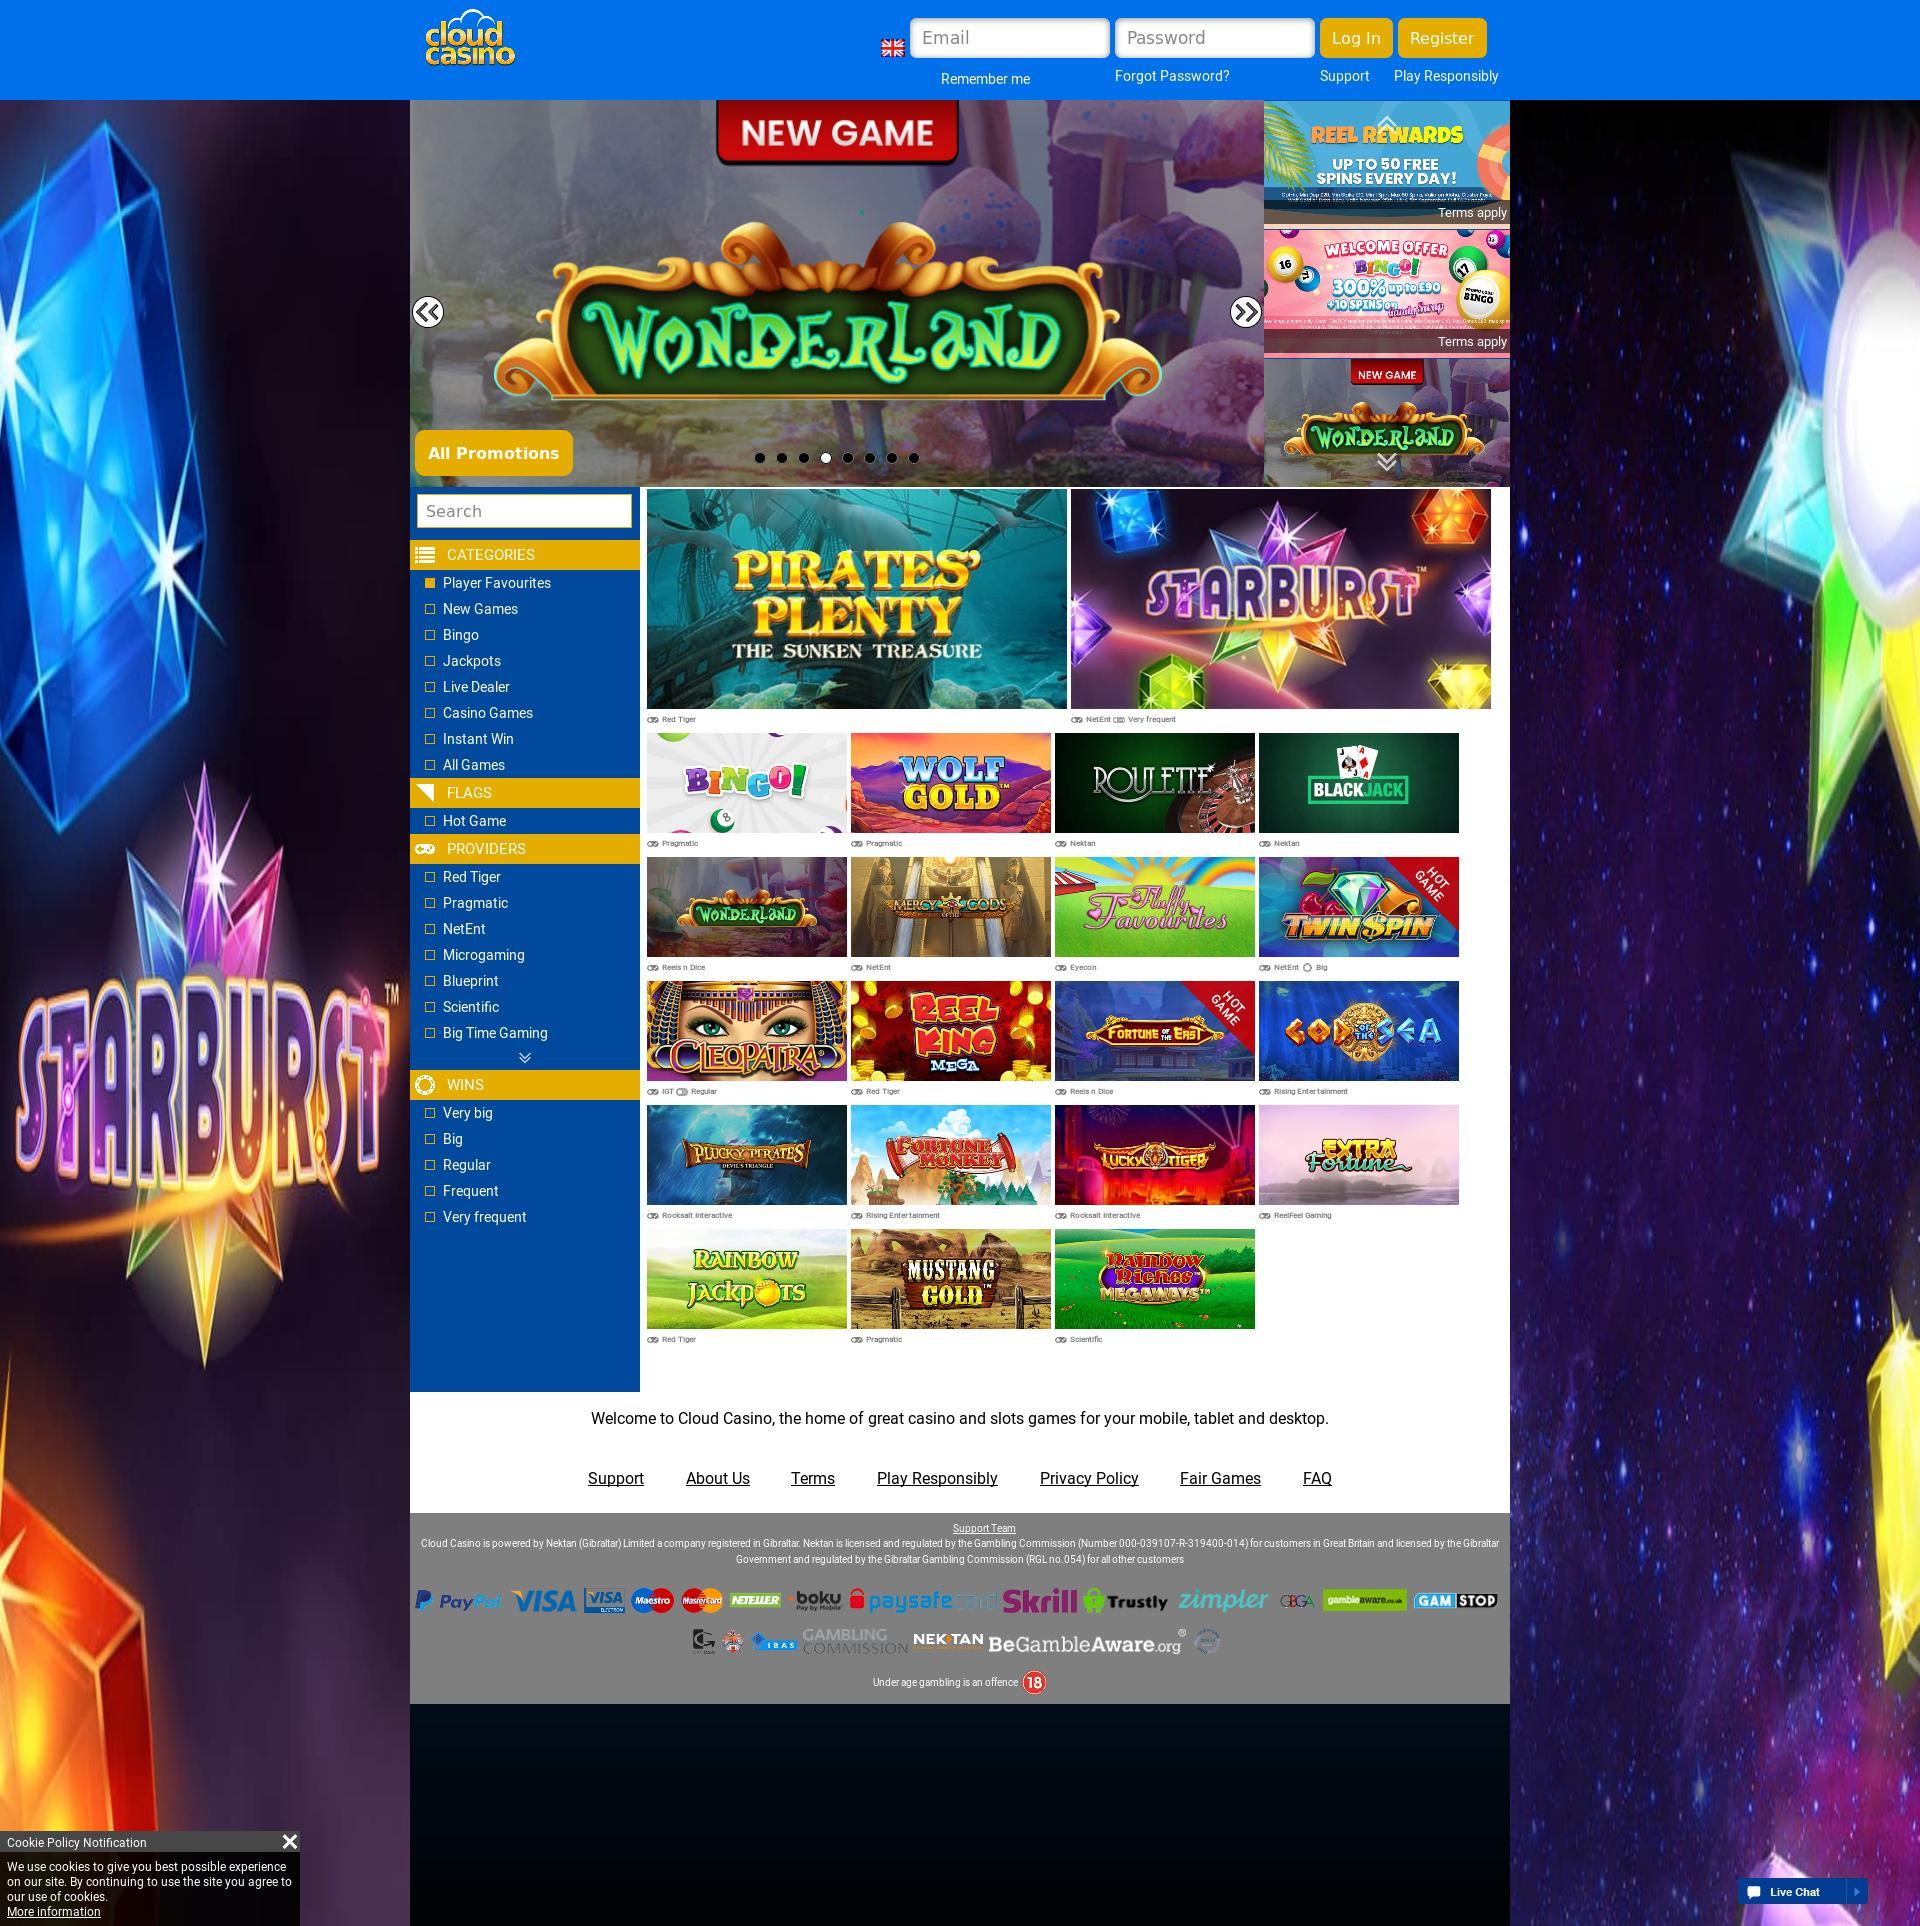 Casino screen Lobby 2019-08-16 for United Kingdom